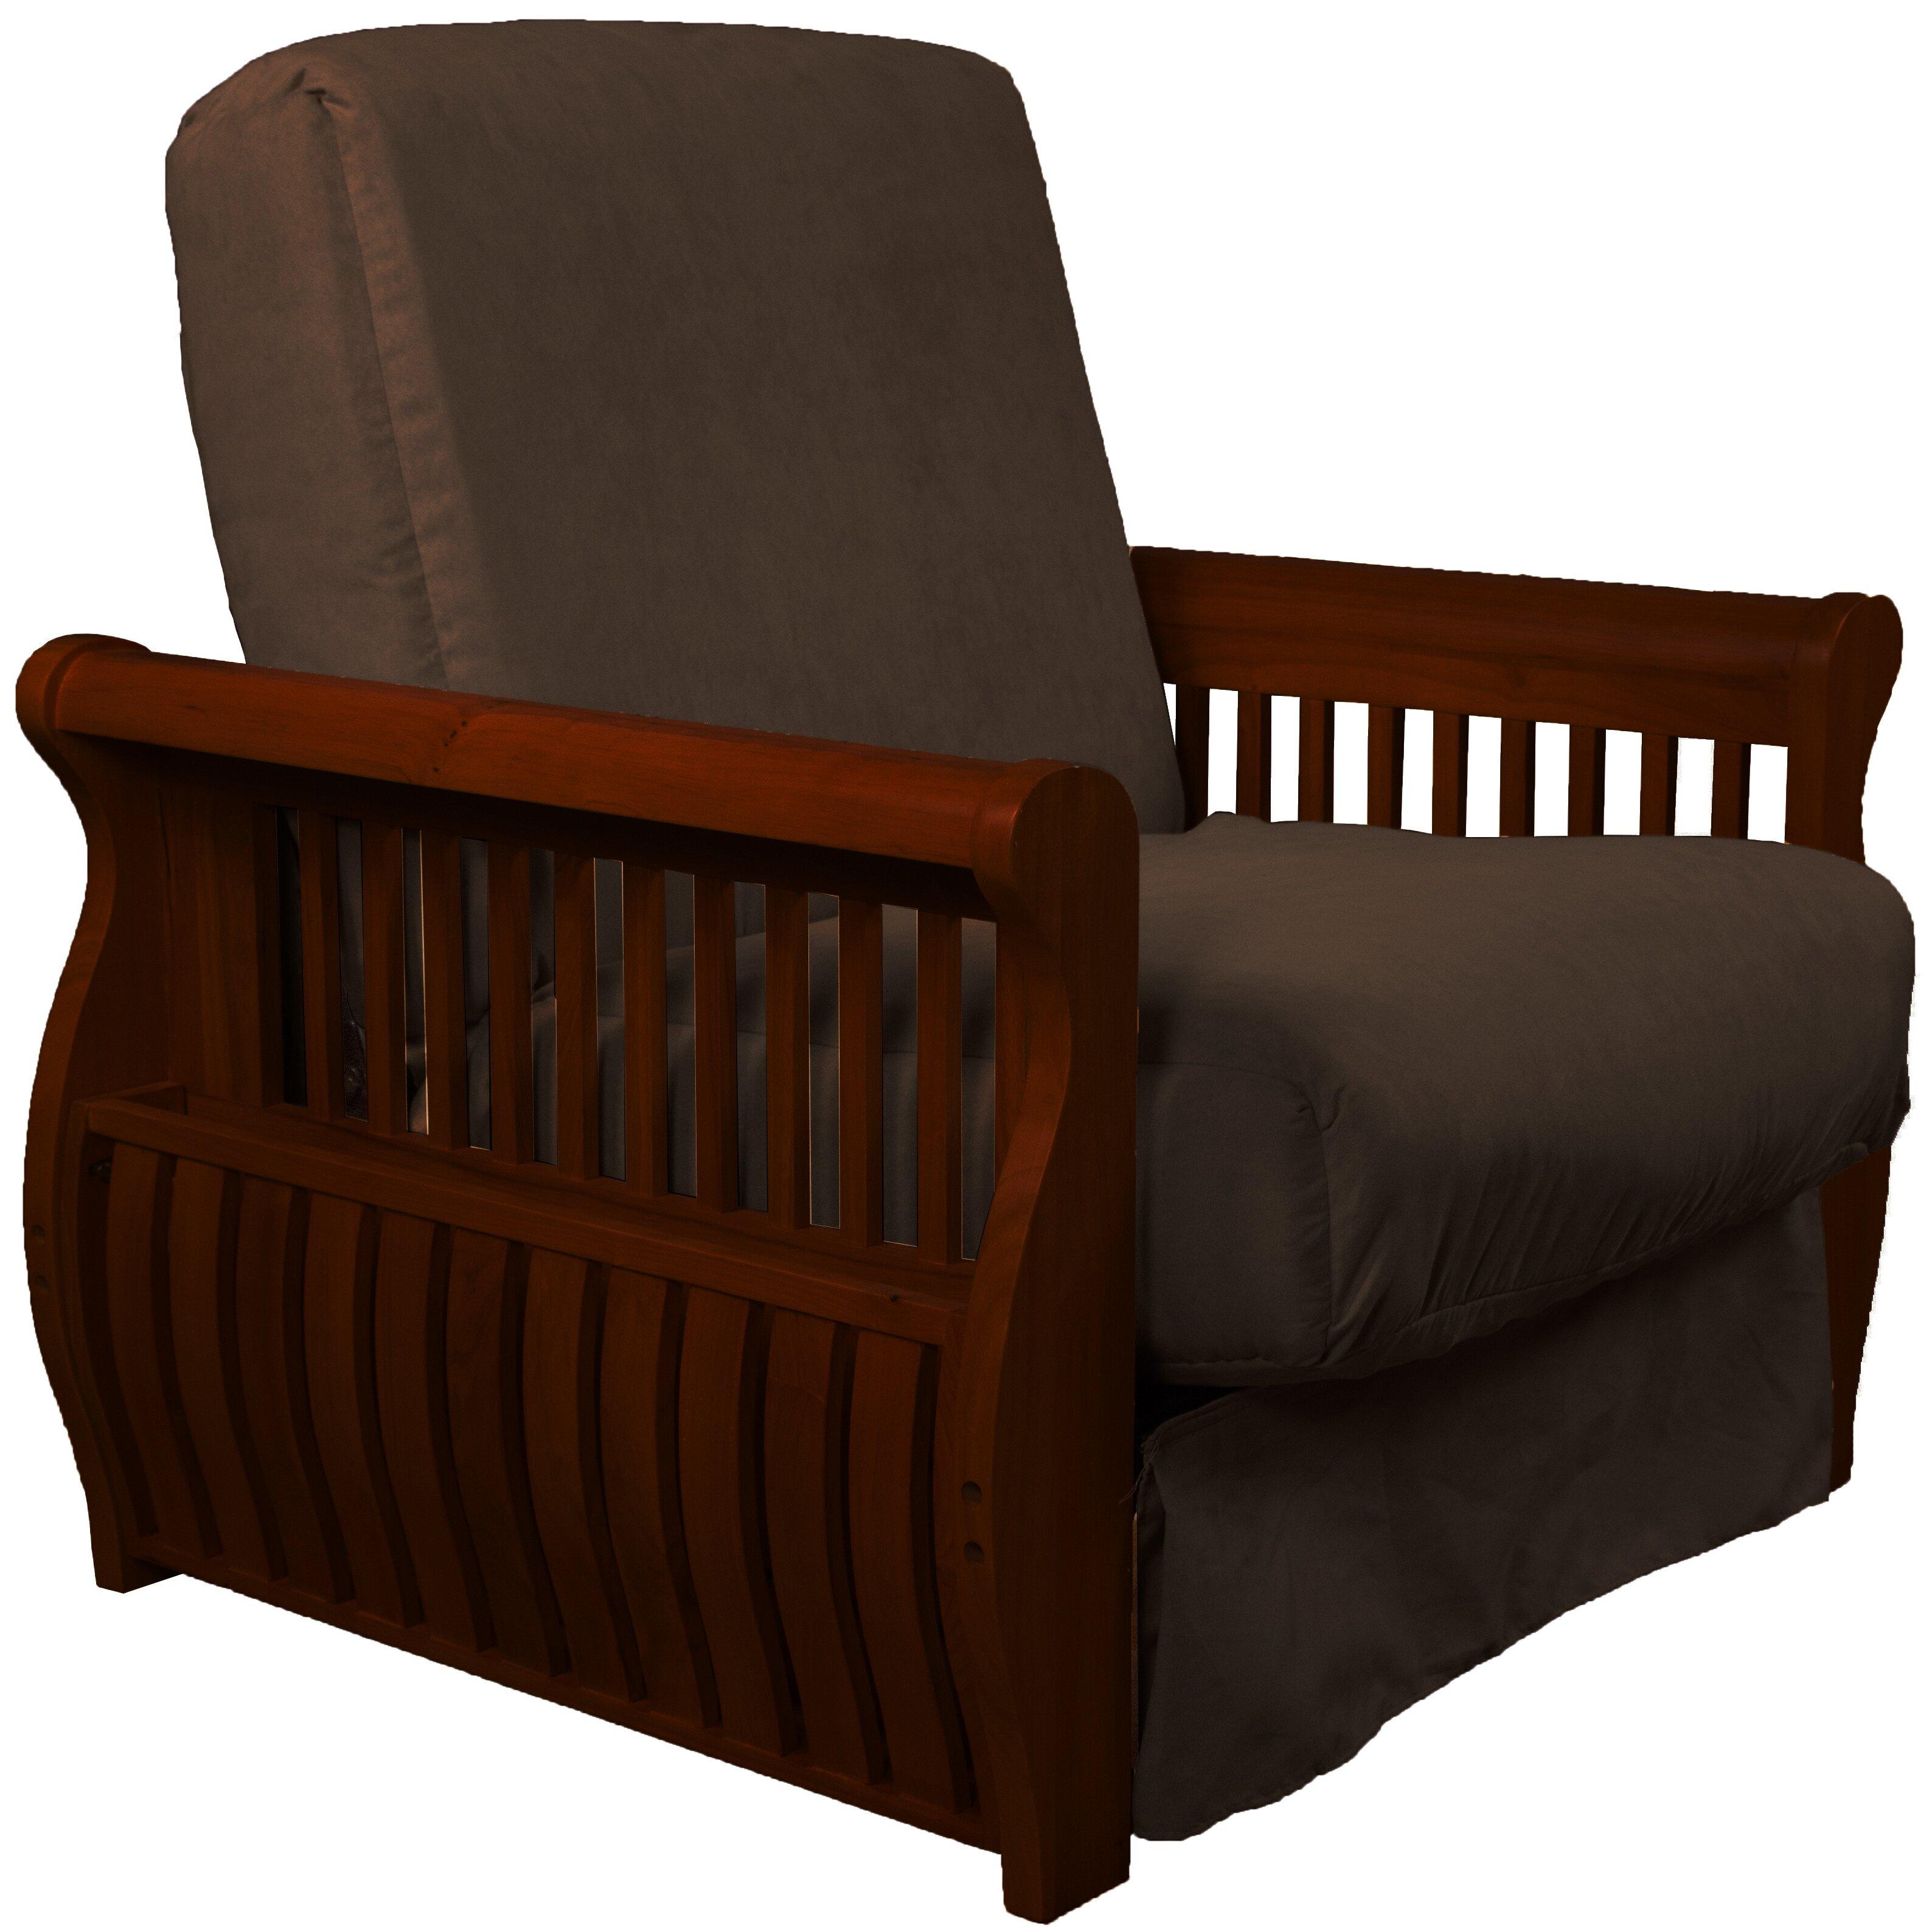 Epic Furnishings Llc Concord Futon Chair Wayfair Ca